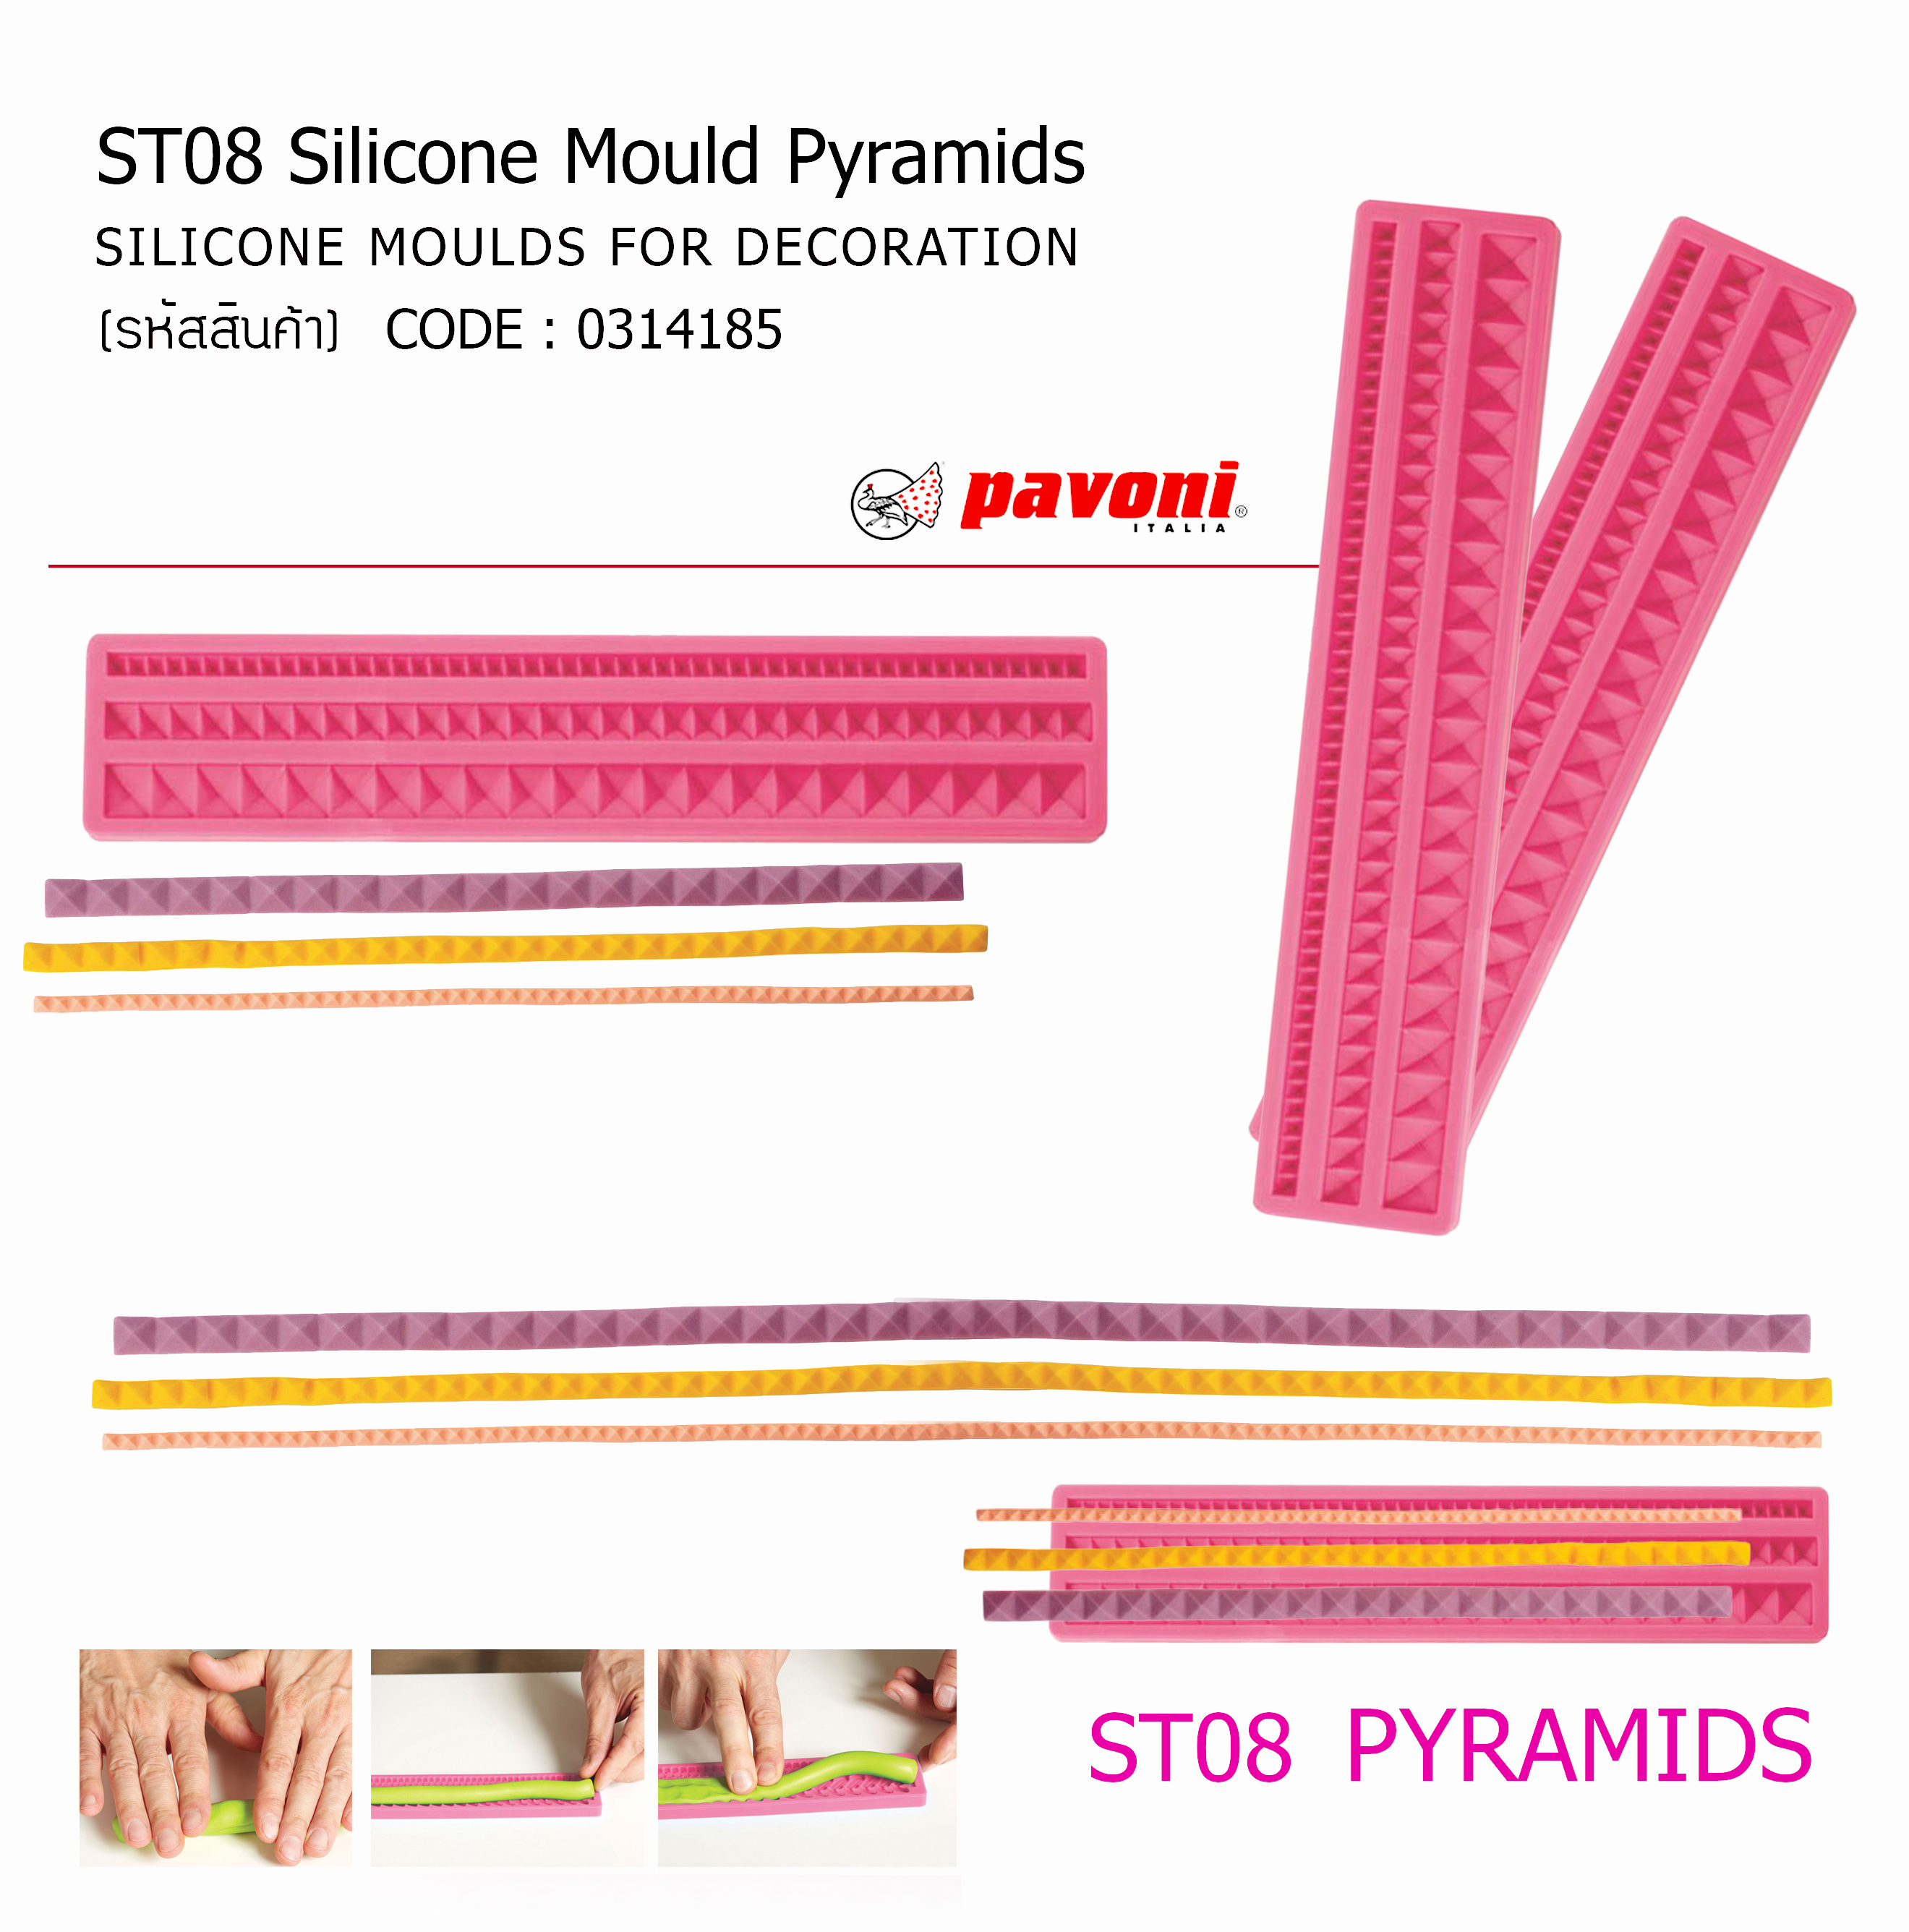 ST08 Silicone Mould Pyramids